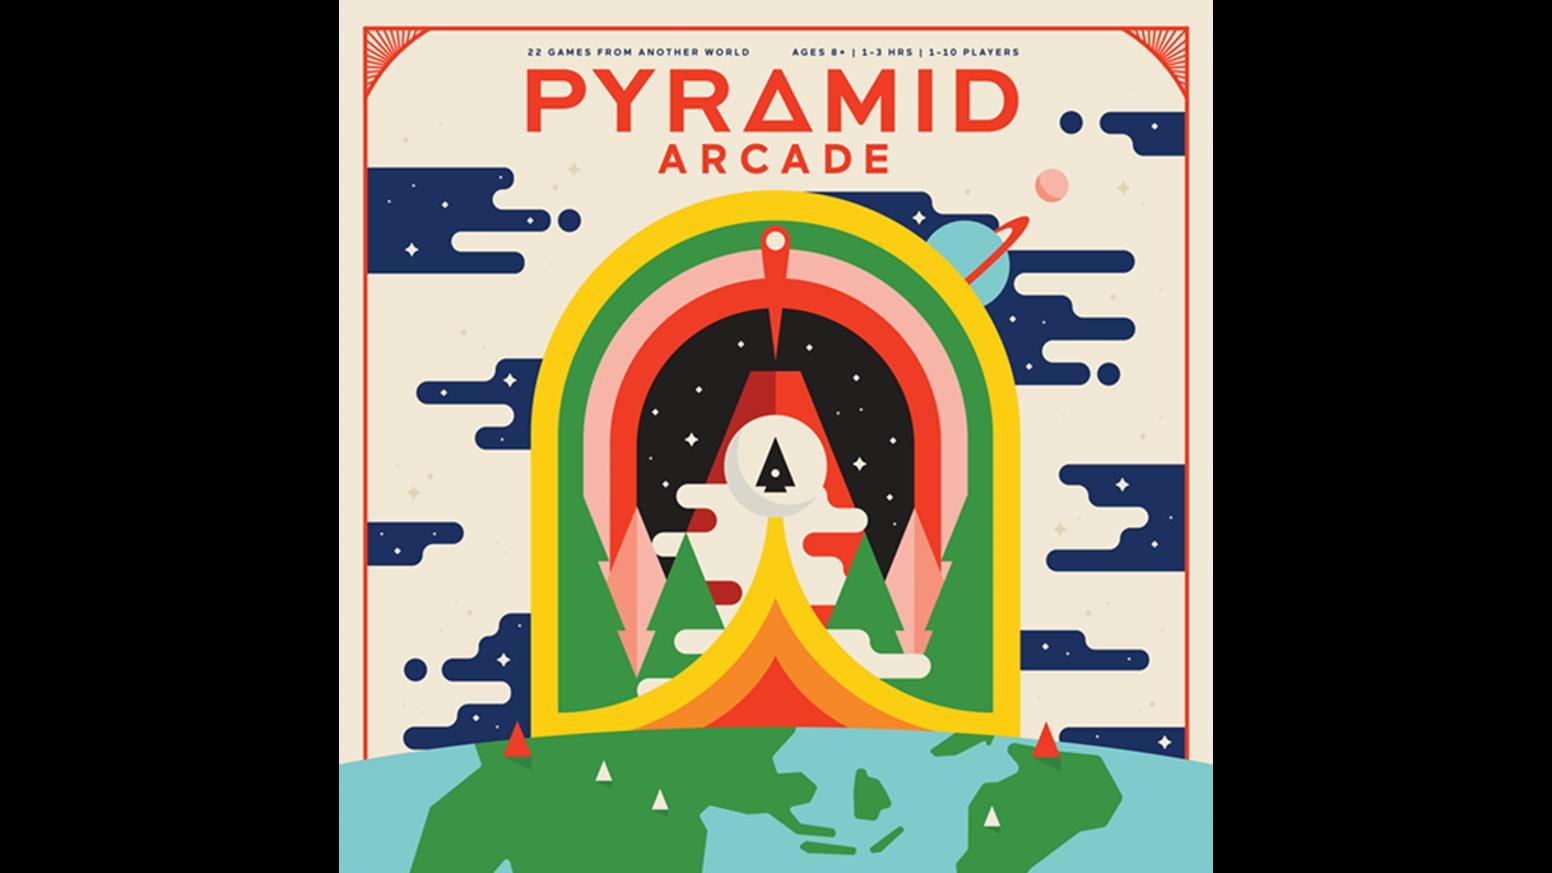 Pyramid arcade pyramids endless. Games clipart deck card